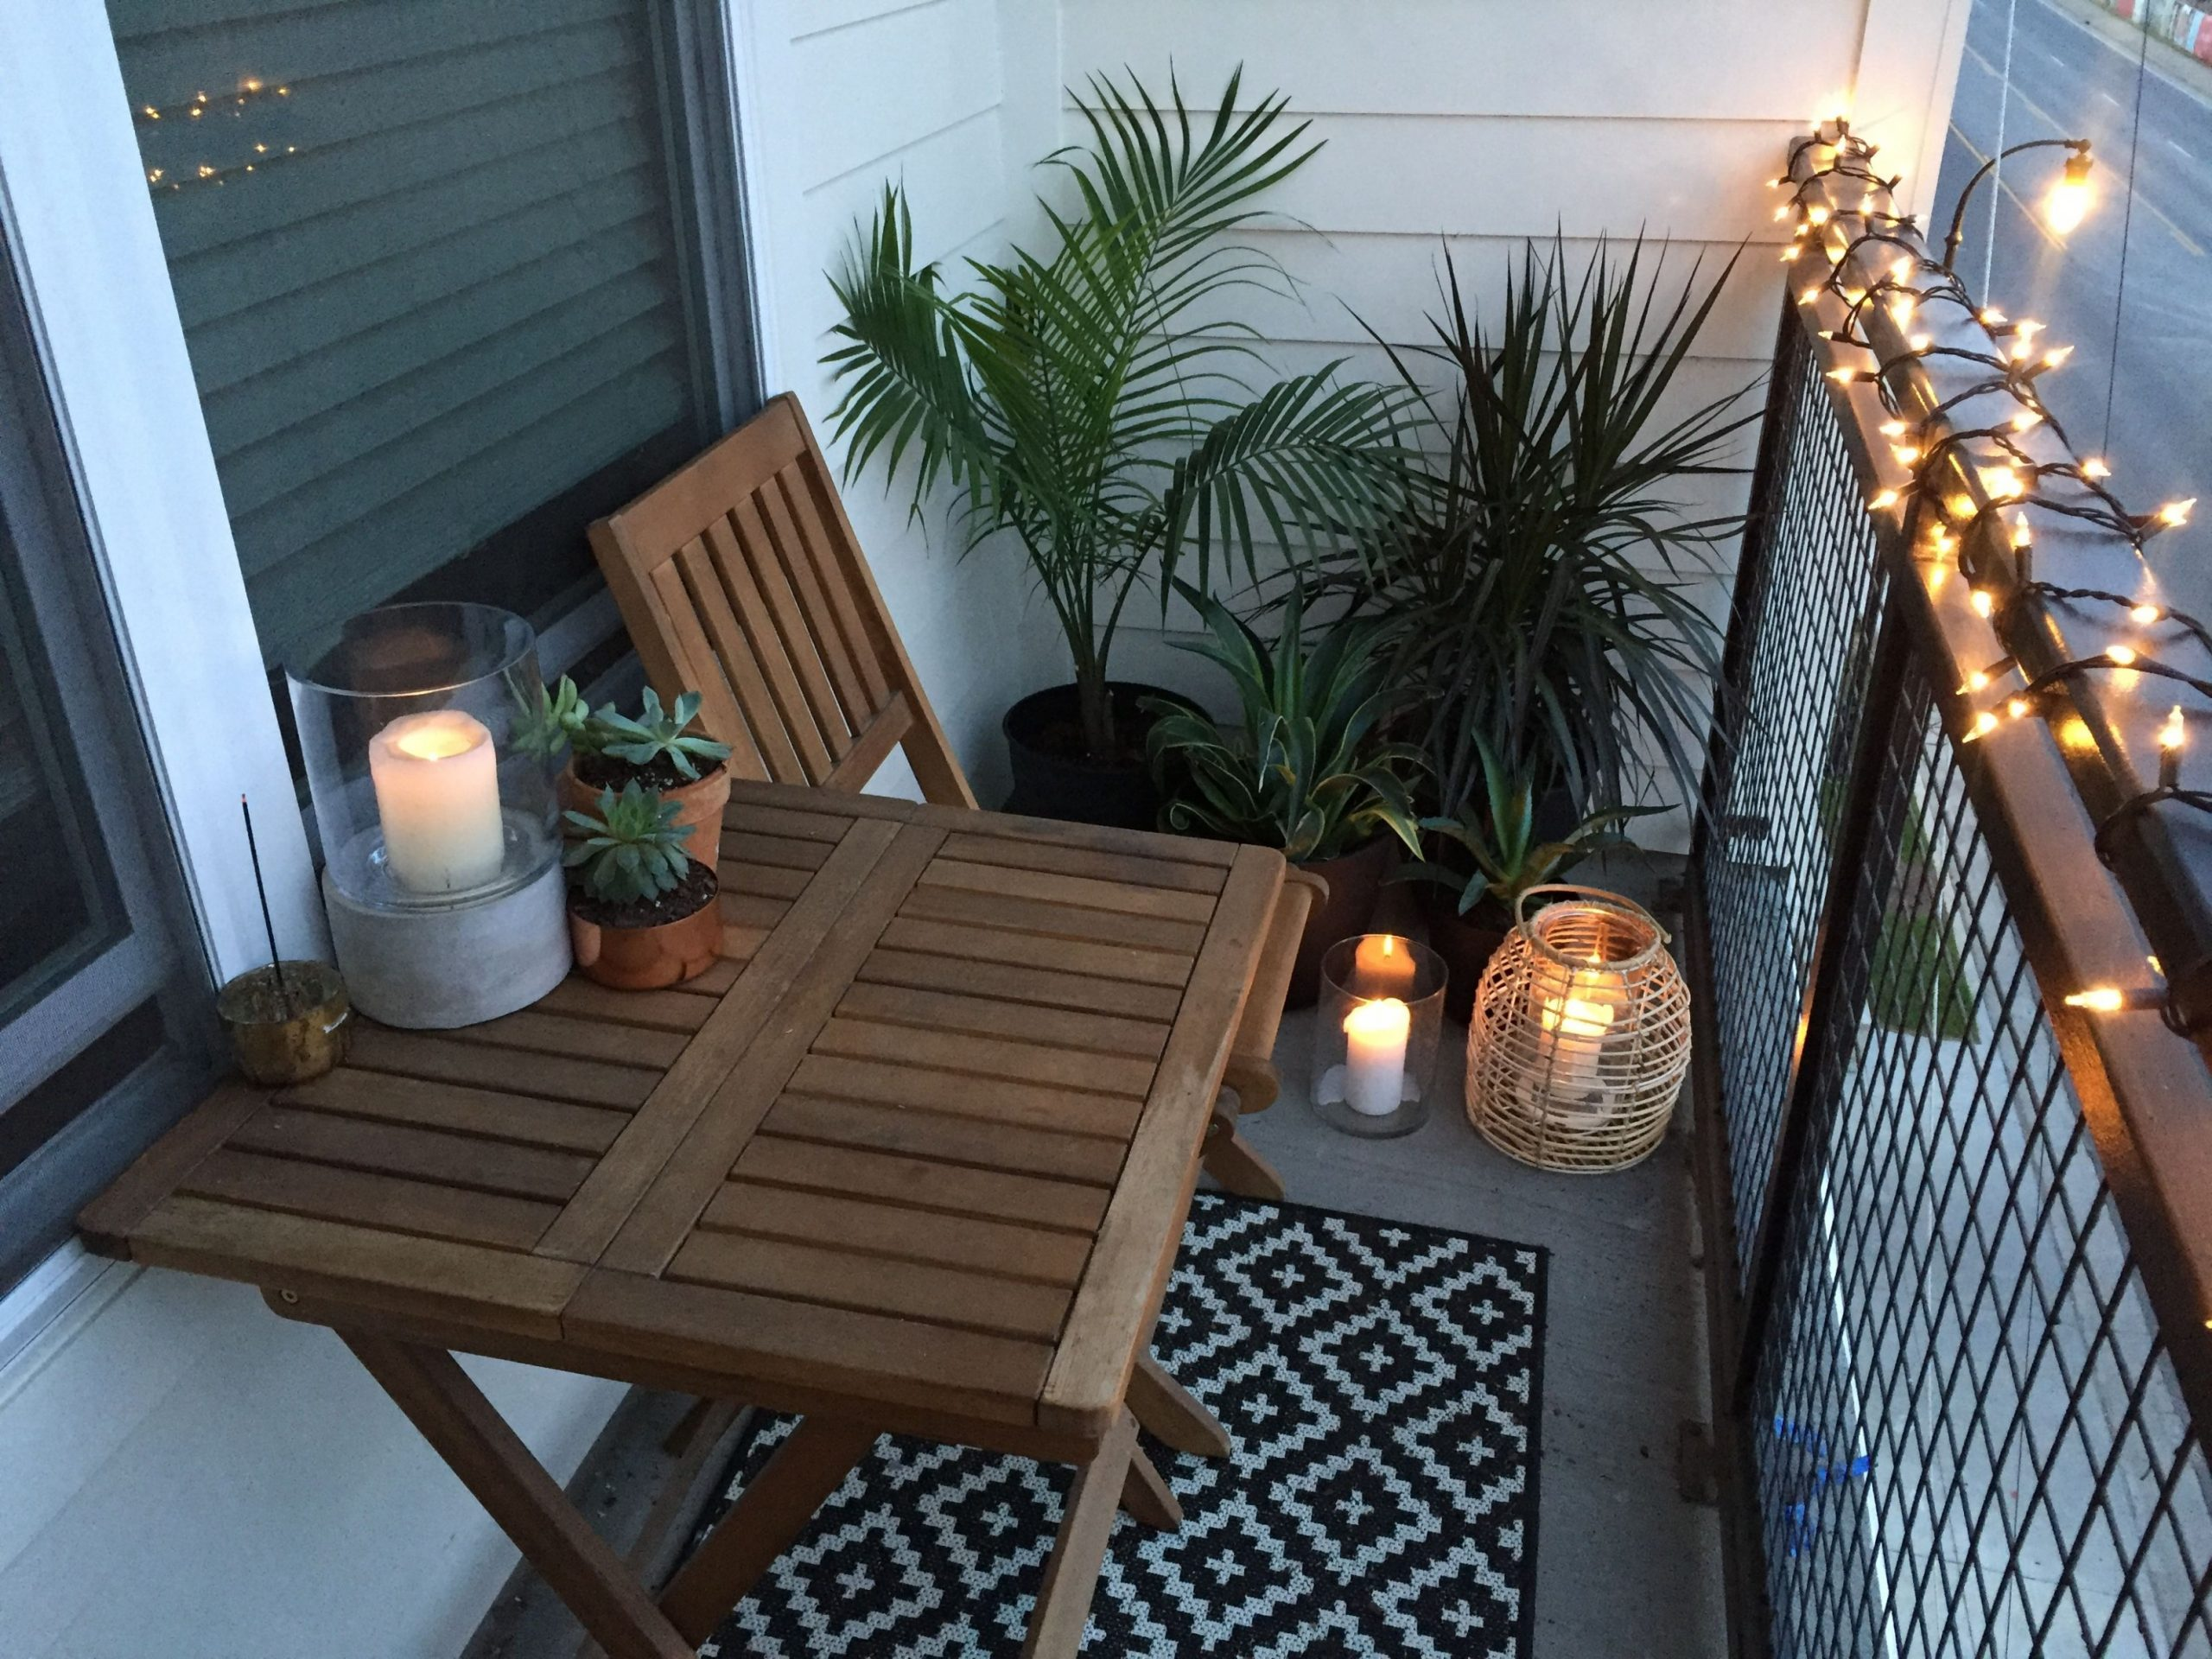 Apartment small balcony decor ideas and design